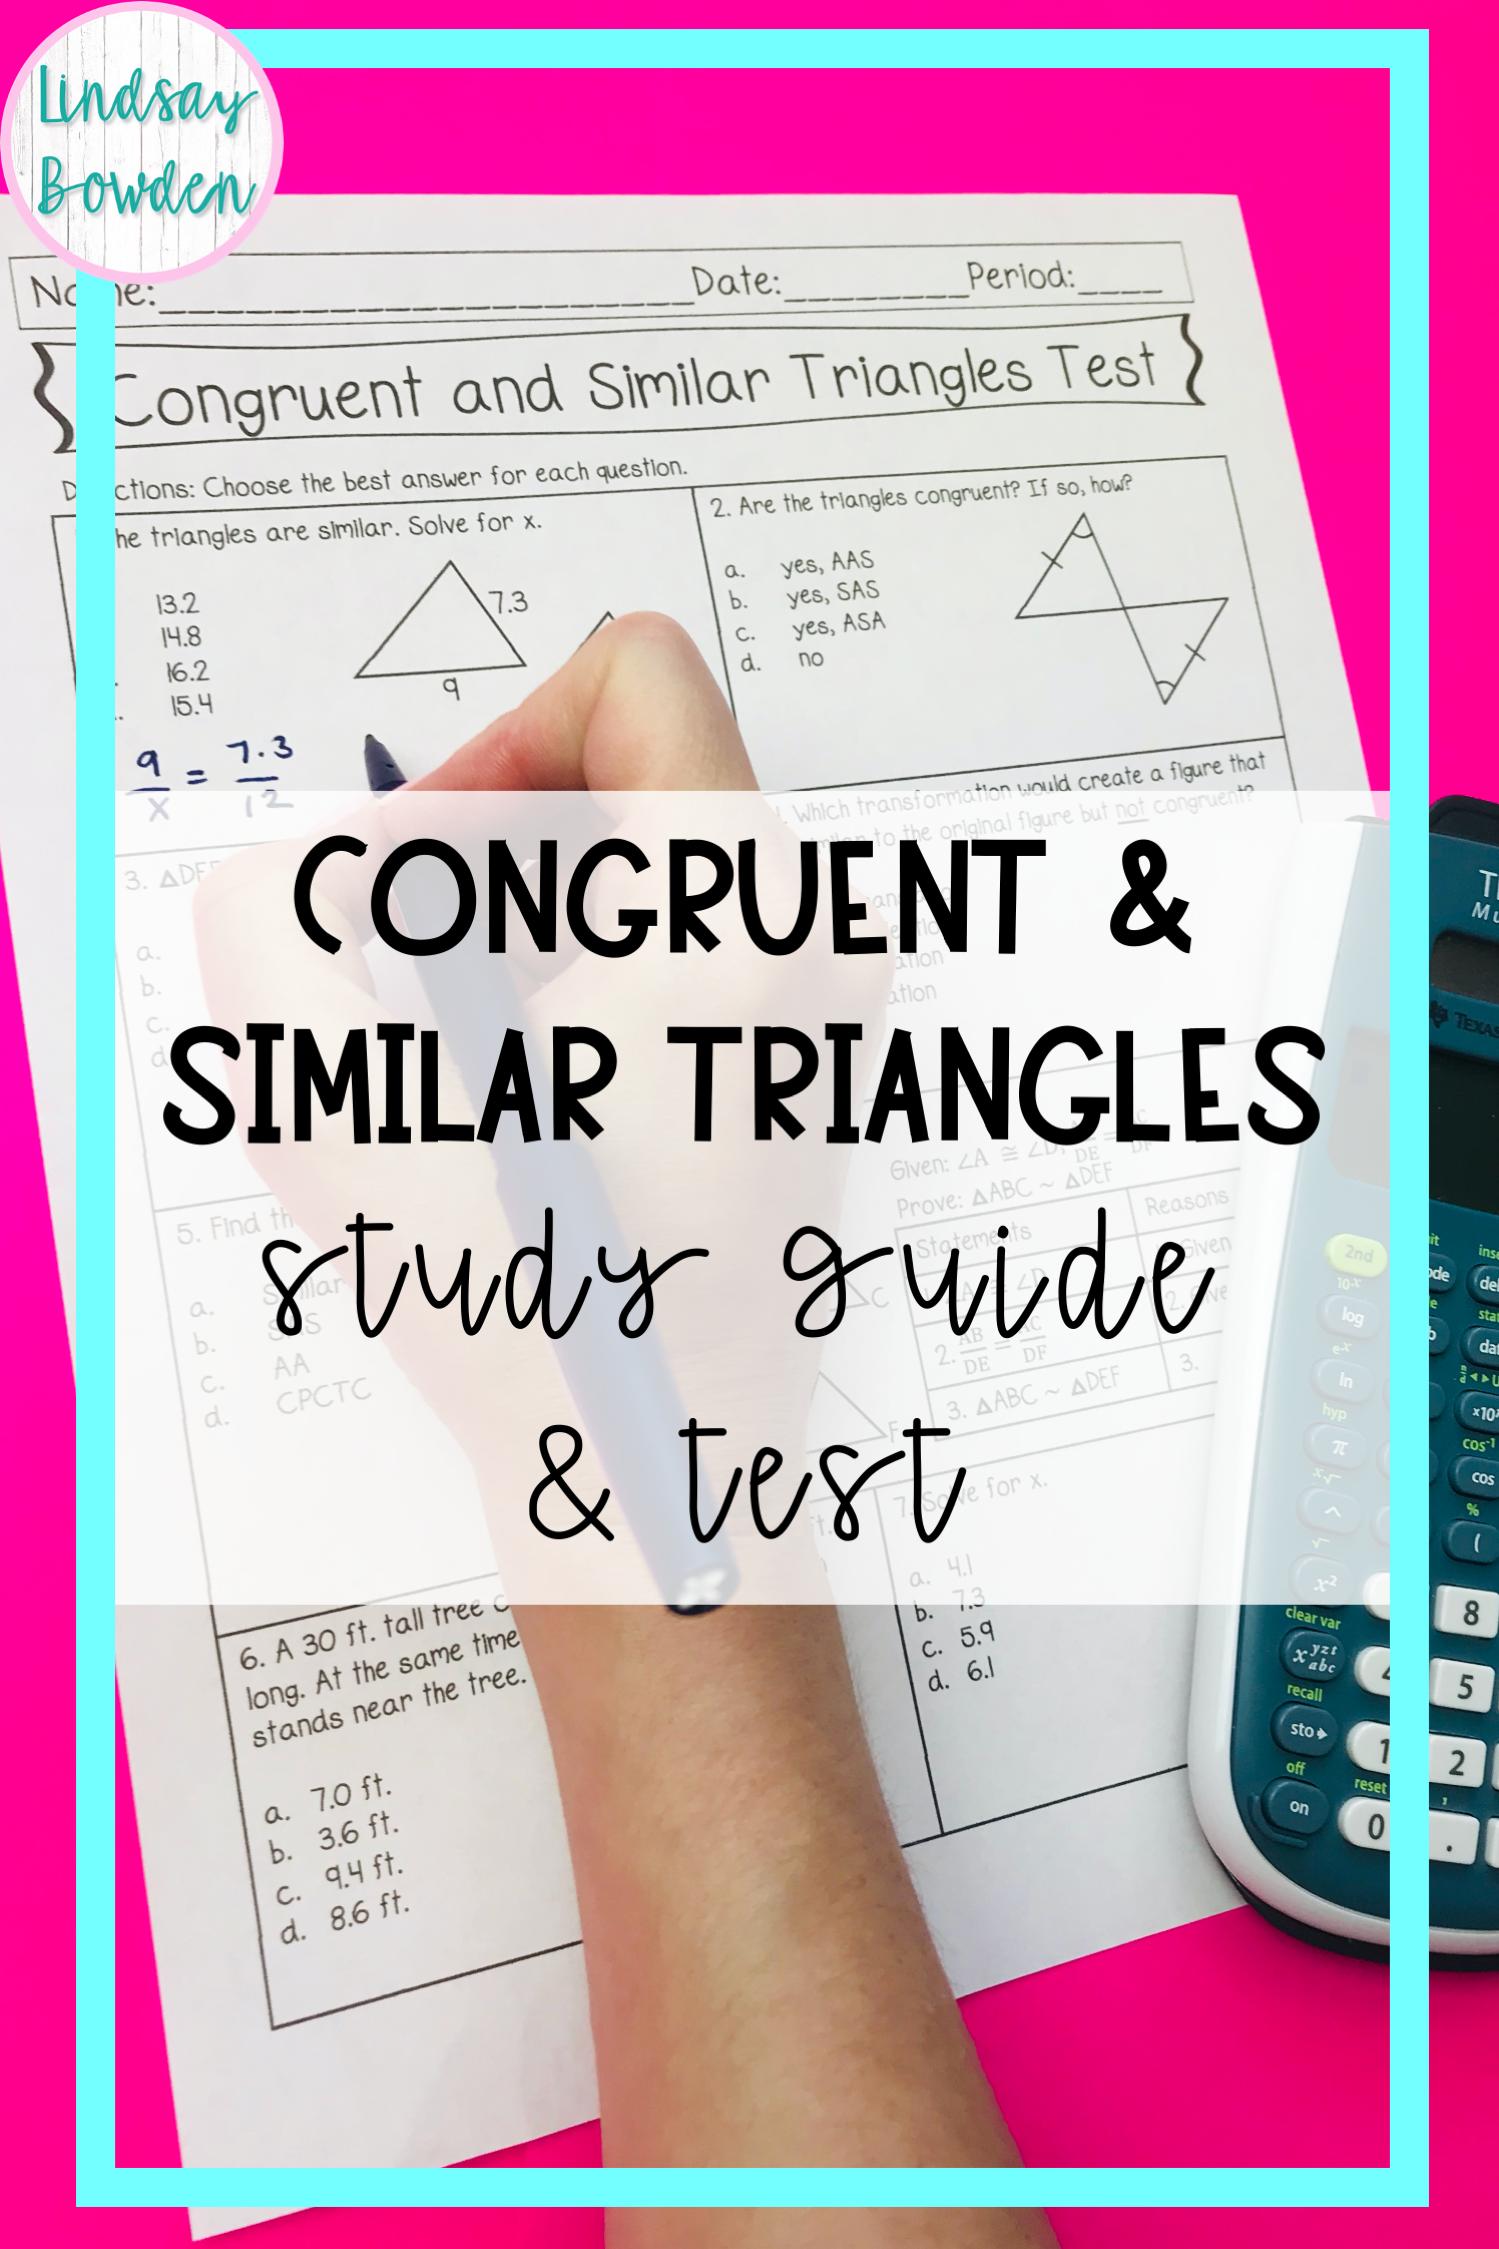 Congruent Triangle Notes SSS, SAS, ASA, AAS, HL